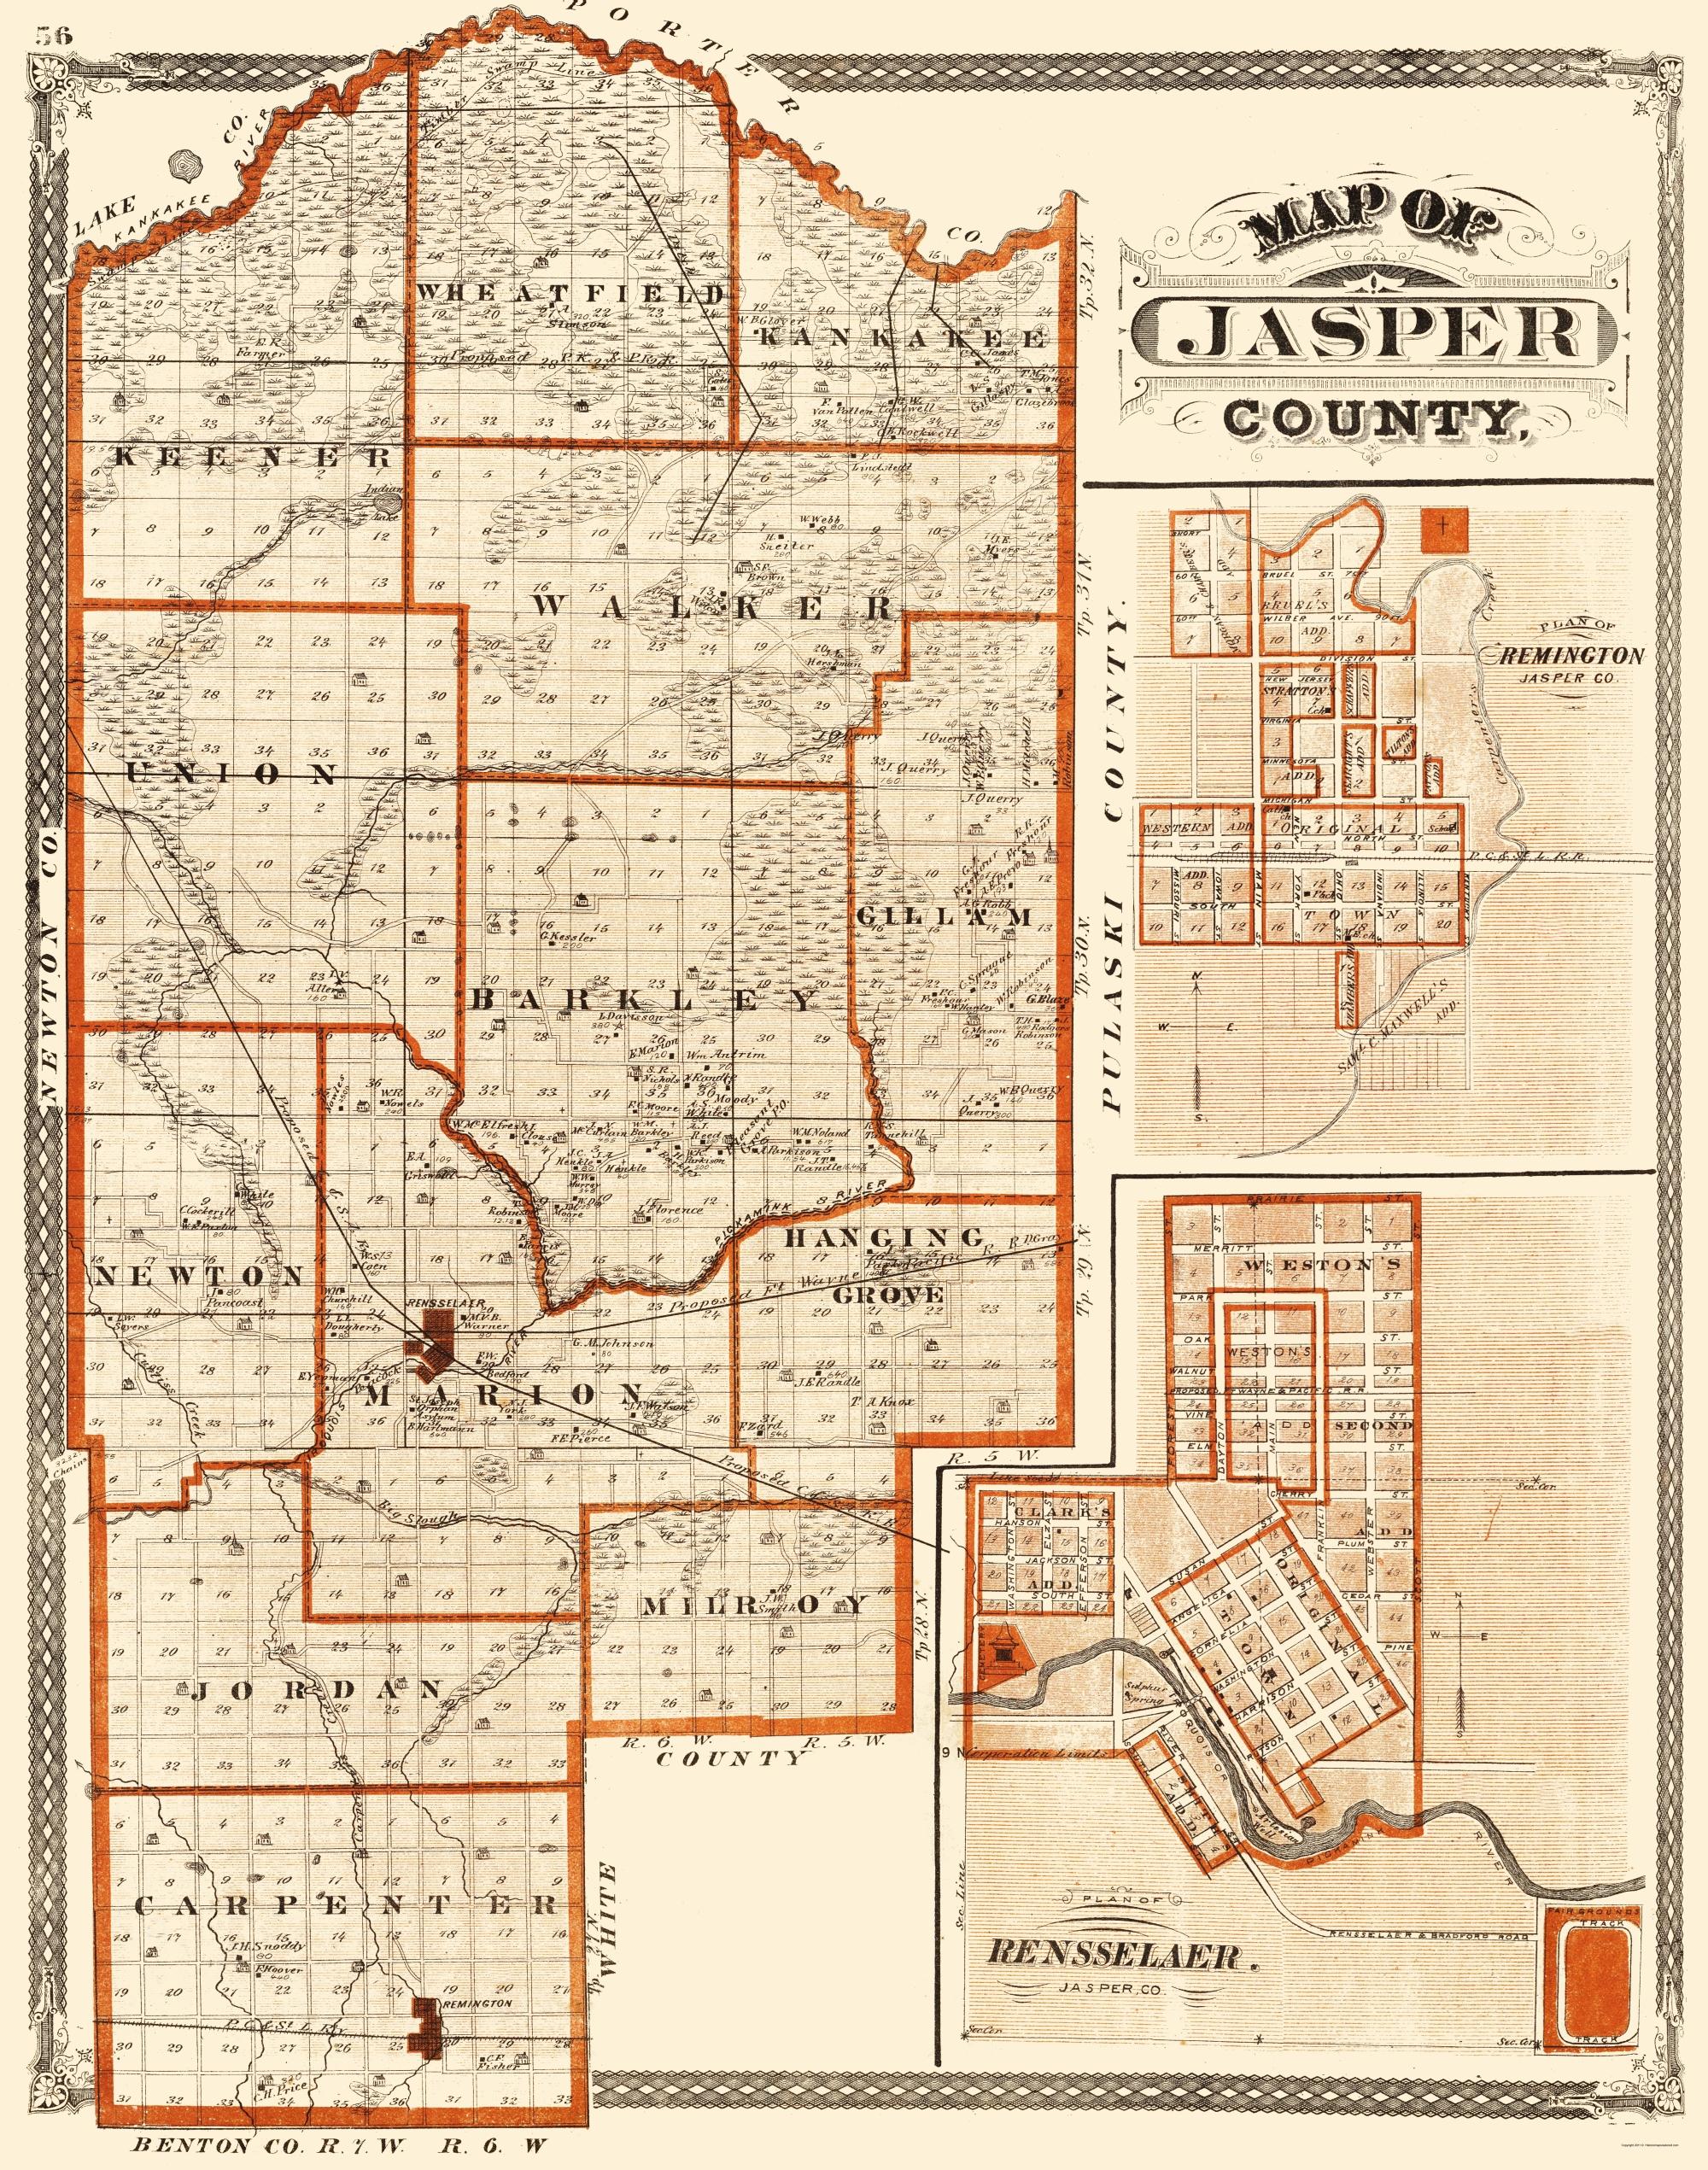 Old County Map Jasper Indiana Baskin 1876